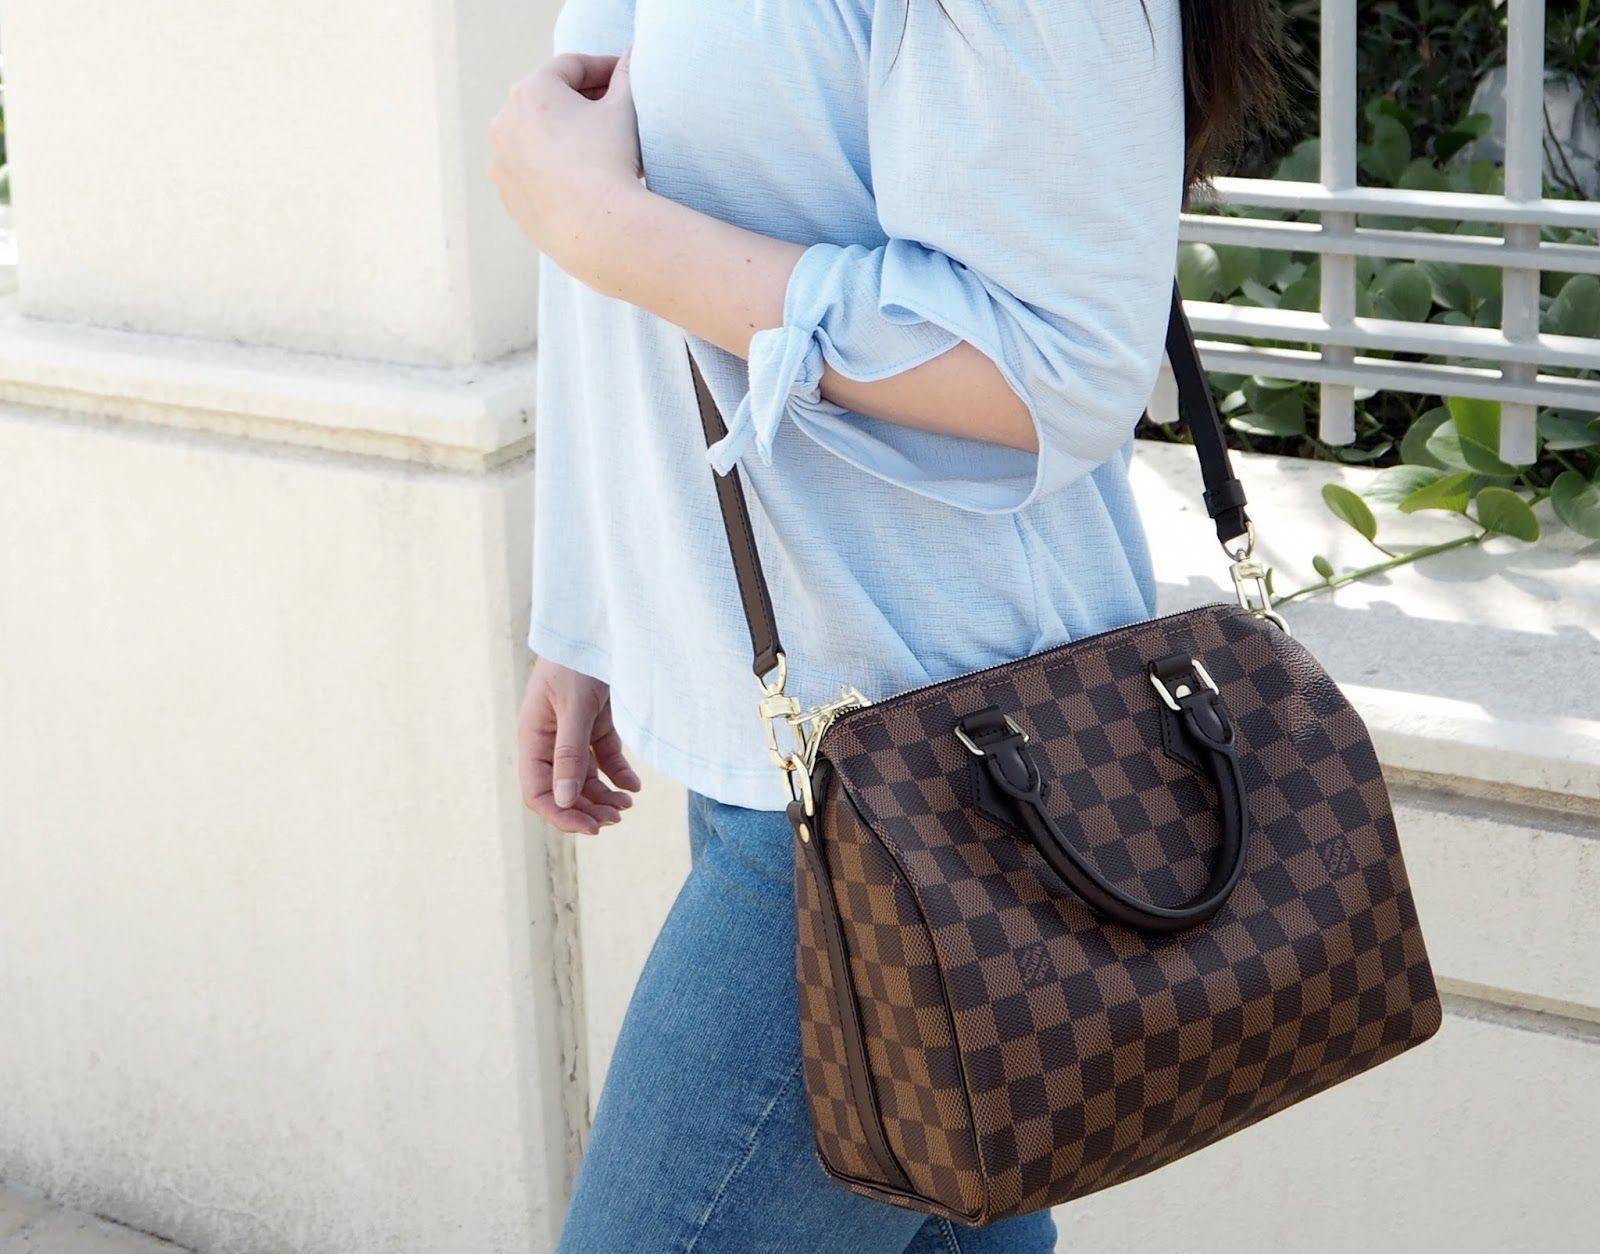 0875b03b9b9a Louis Vuitton Speedy Bandouliere 25 Review   Outfit Shots   Louisvuittonhandbags